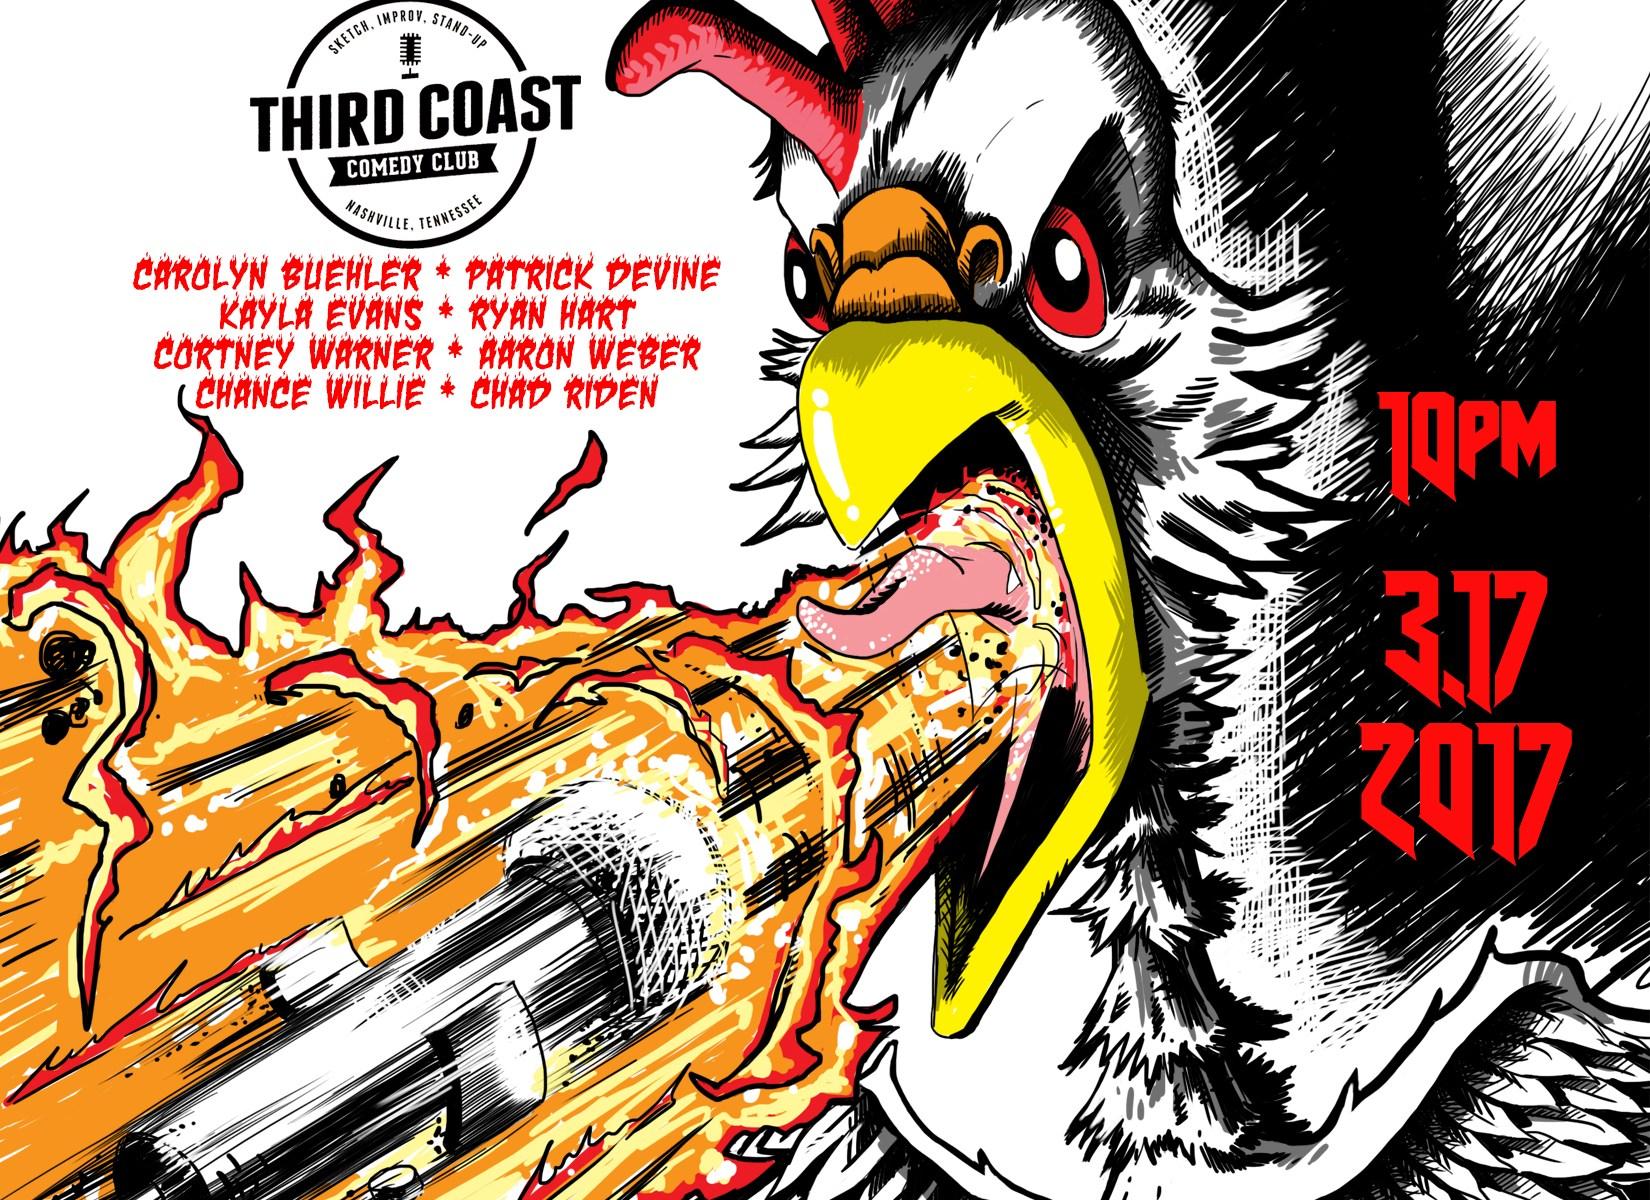 Comedy Cataclysm: comics eat nashville hot chicken, then attempt to tell jokes. 10pm Friday 3/17/2016 at Third Coast Comedy Club: Chad Riden & friends Carolyn Buehler, Patrick Devine, Kayla Evans, Ryan Hart, Cortney Warner, Aaron Weber, Chance Willie.